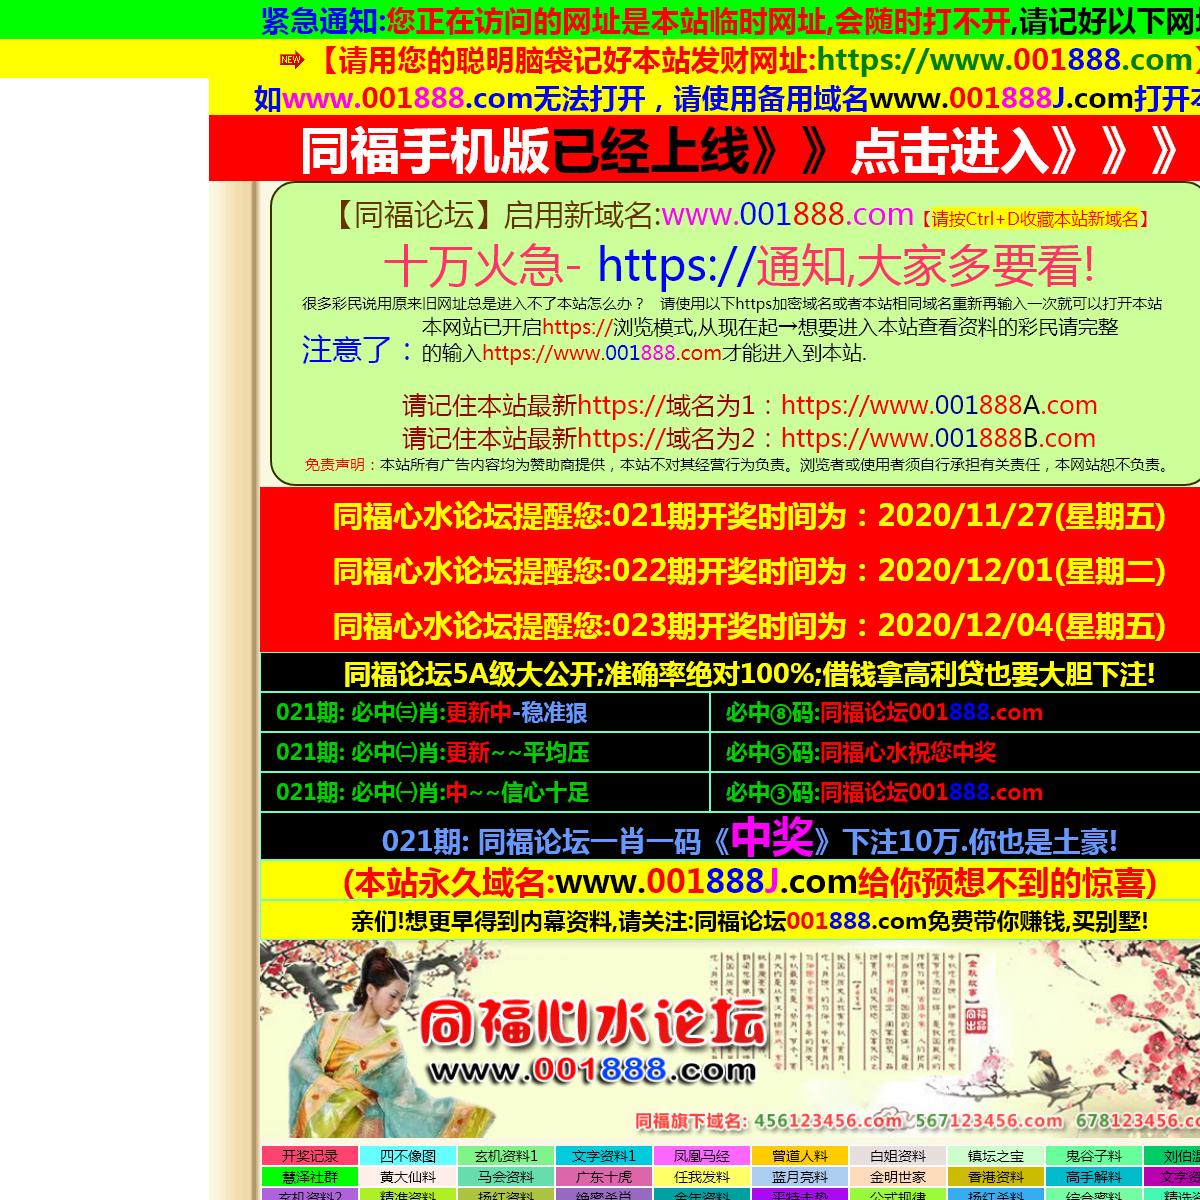 01kjcom一开奖直播,01kj第一开奖,首选红双喜,499456.com